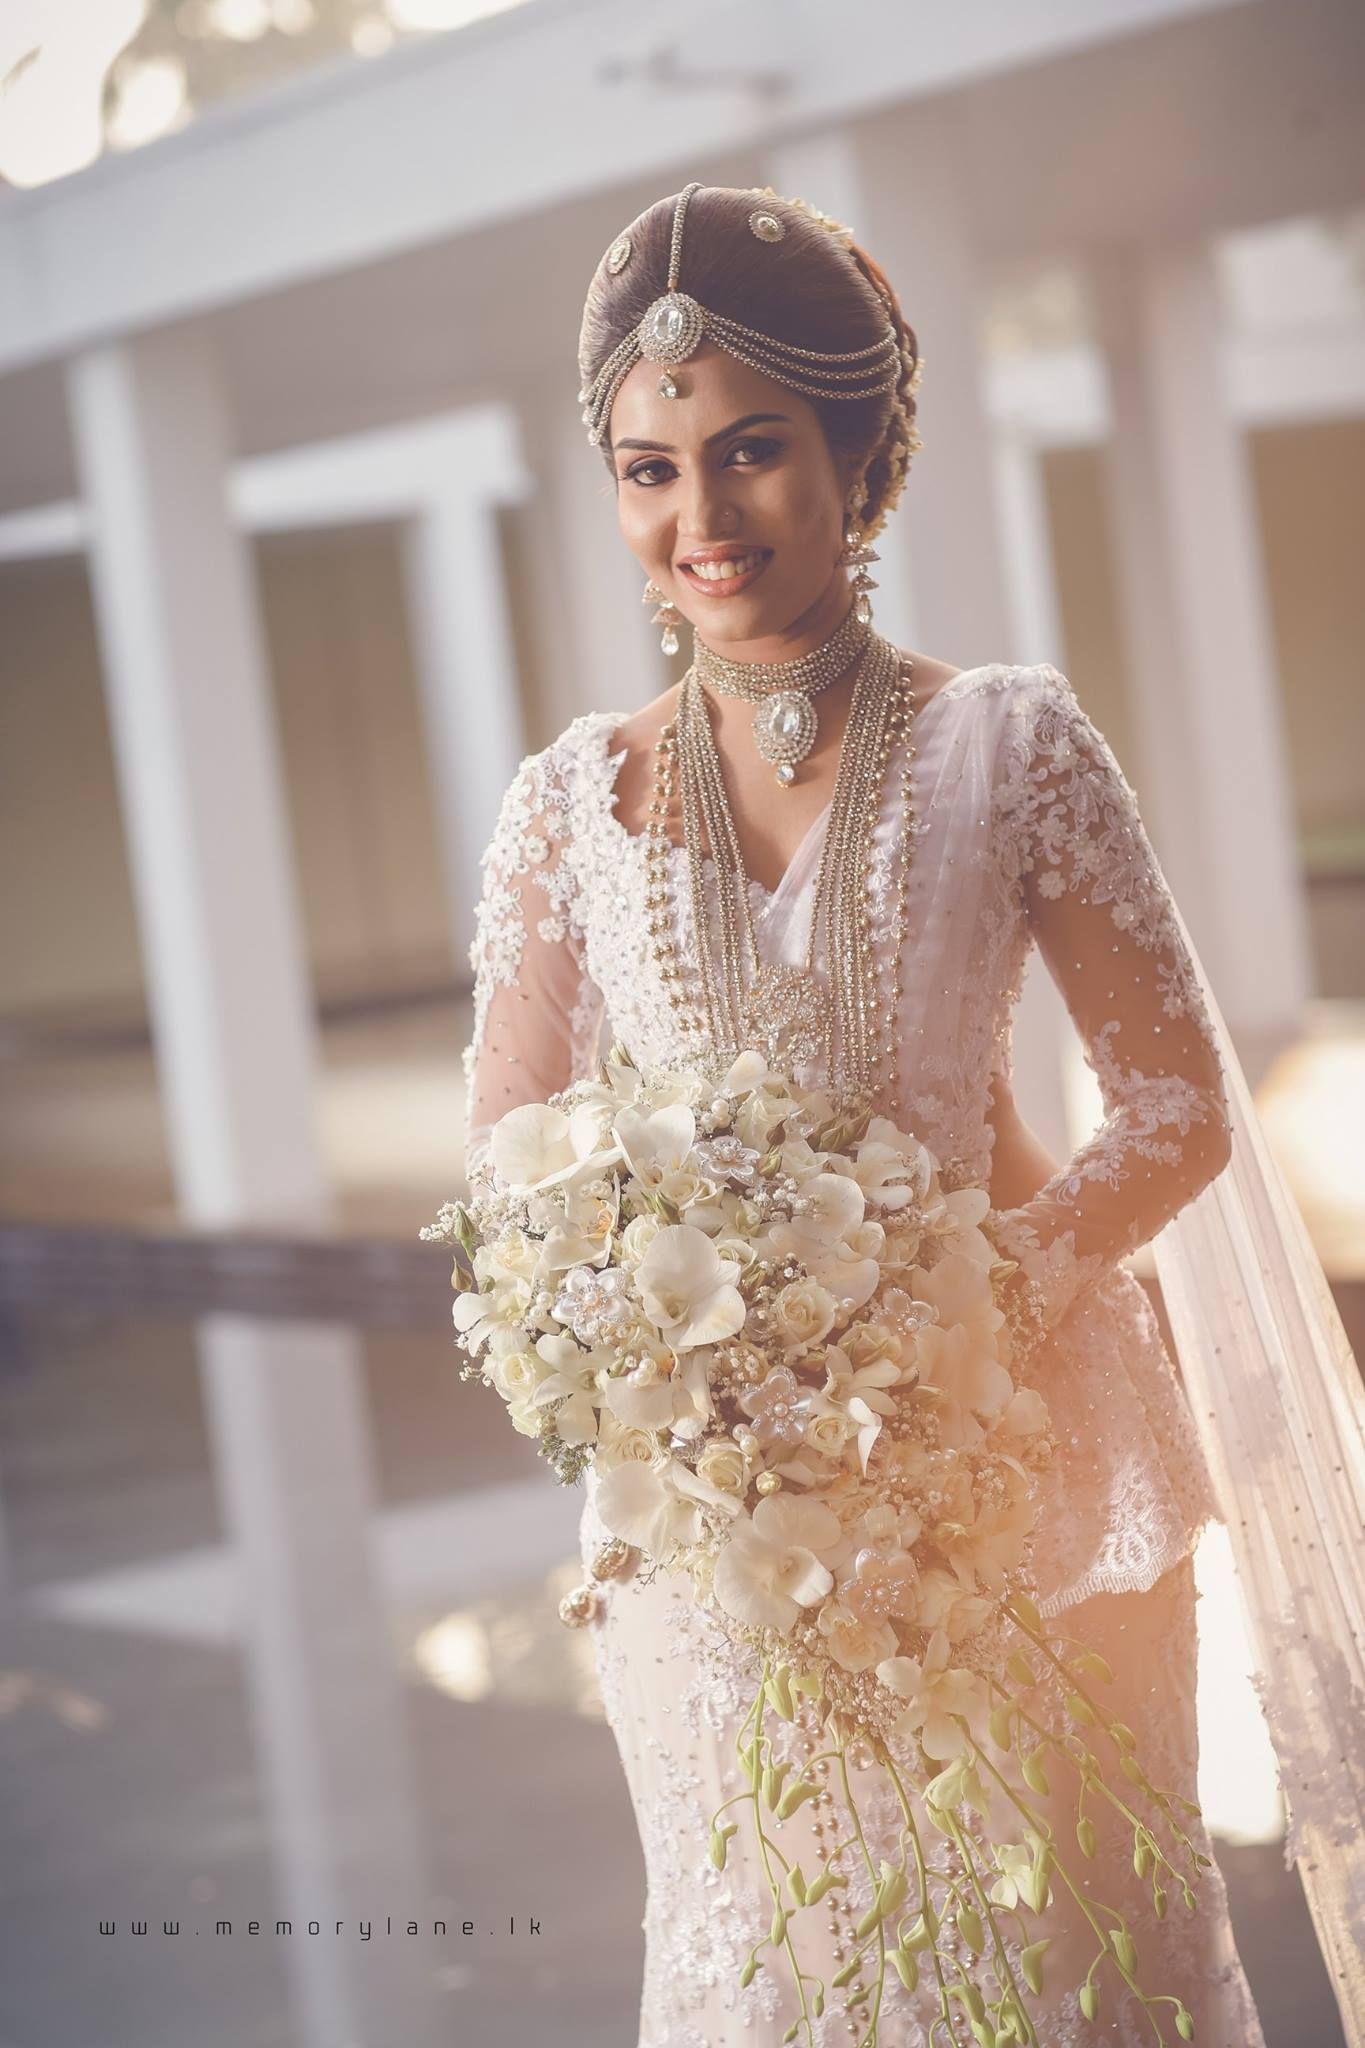 Sri lankan bride sri lankan weddings pinterest saree for Sri lankan wedding dress